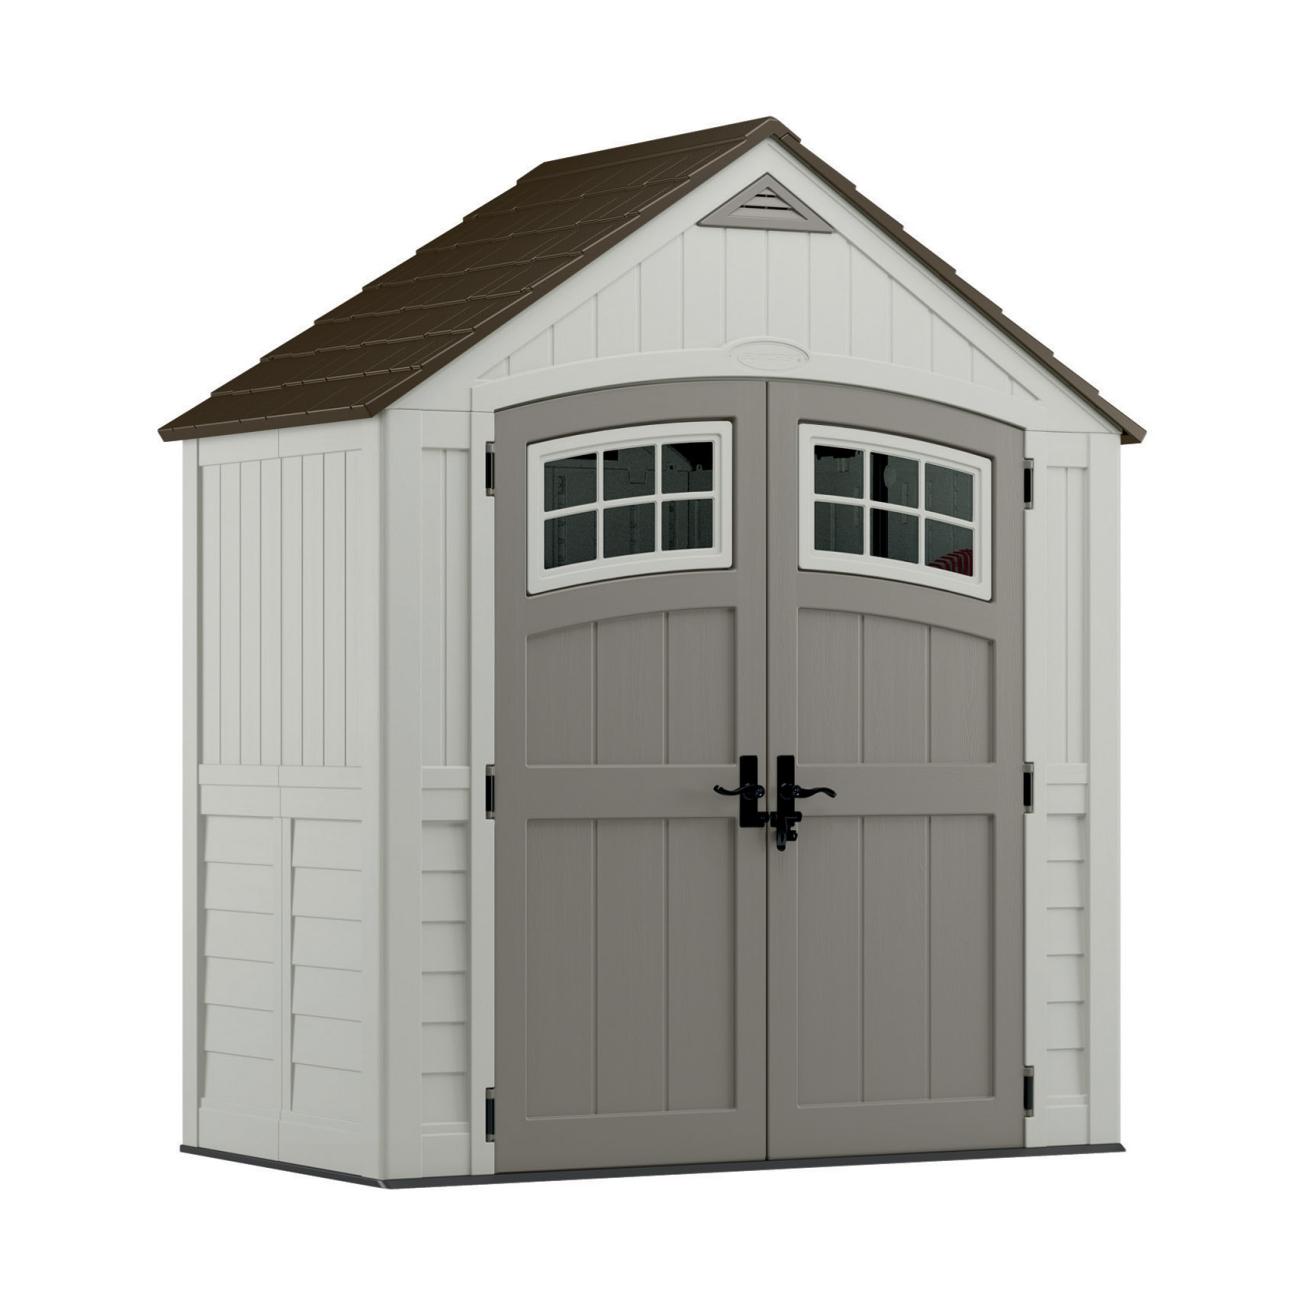 storage sheds suncast 7ft x 4ft cascade resin storage shed (bms7400) - ace hardware FNDMQRY